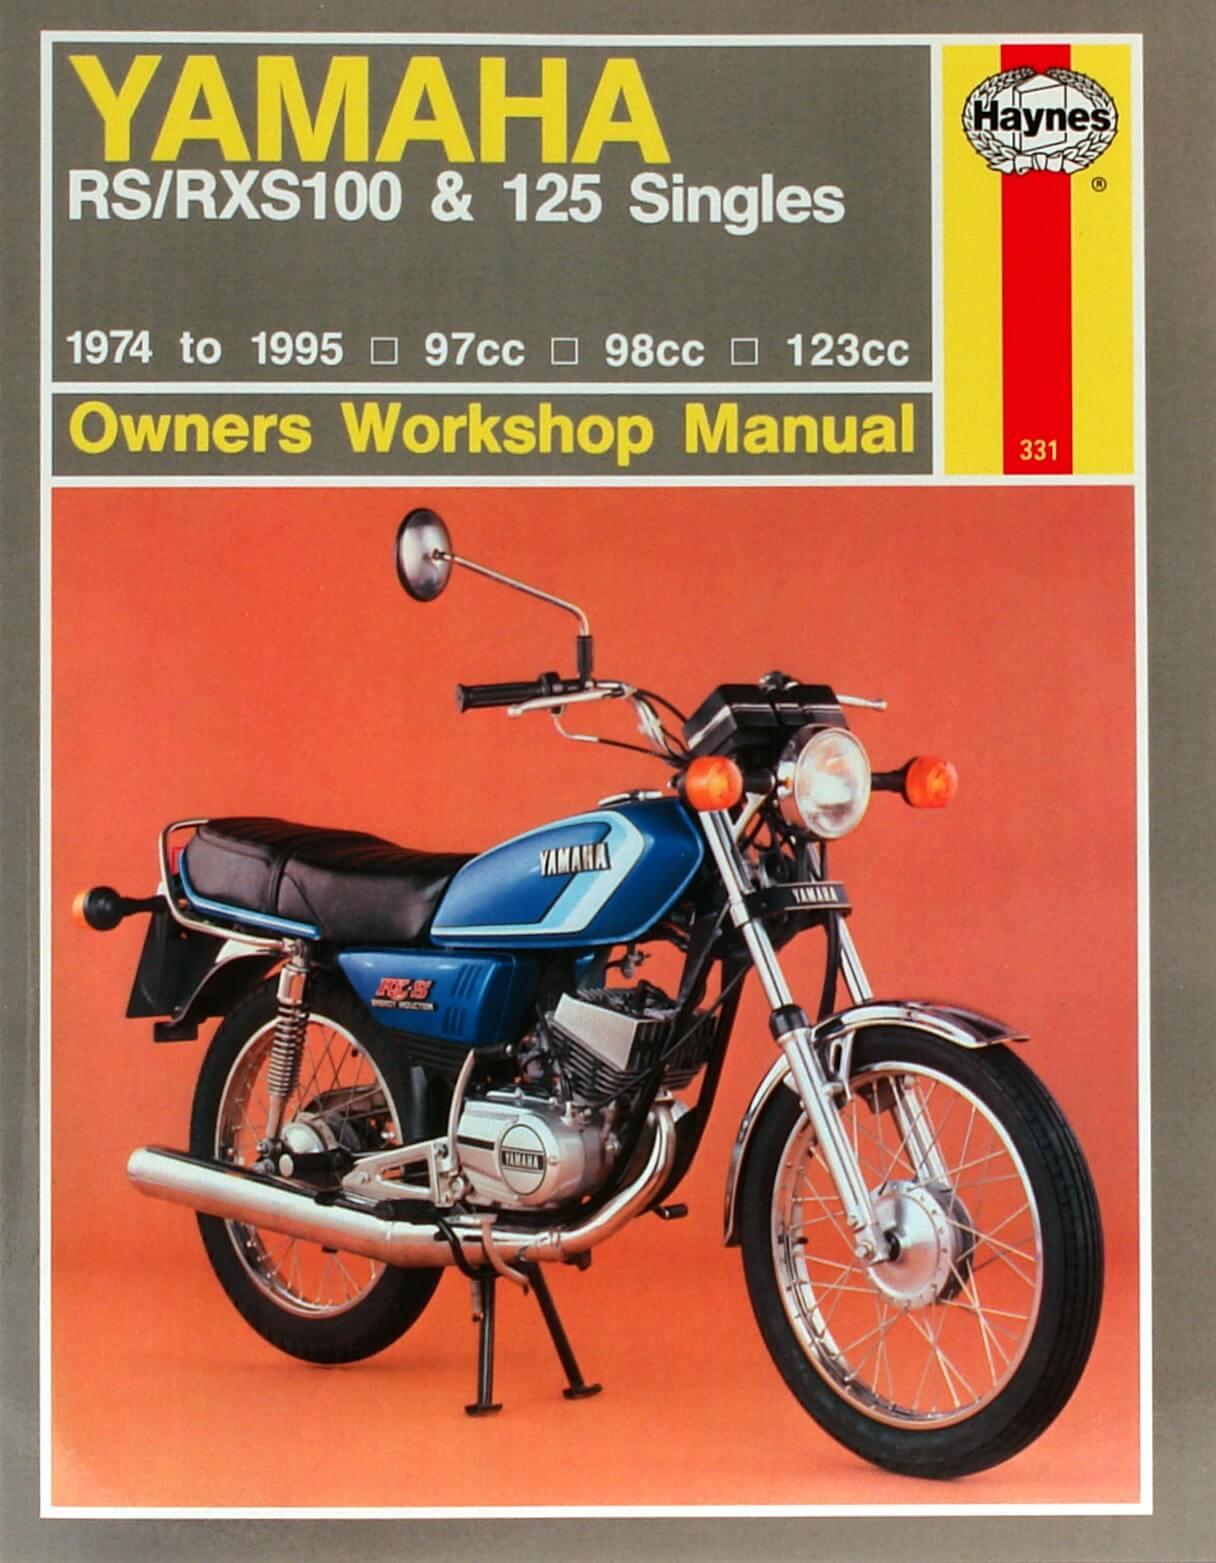 customer reviews on rx100 workshop manual man003 manuals and rh yambits co uk yamaha rx 100 workshop manual Yamaha RX 100 New Launch